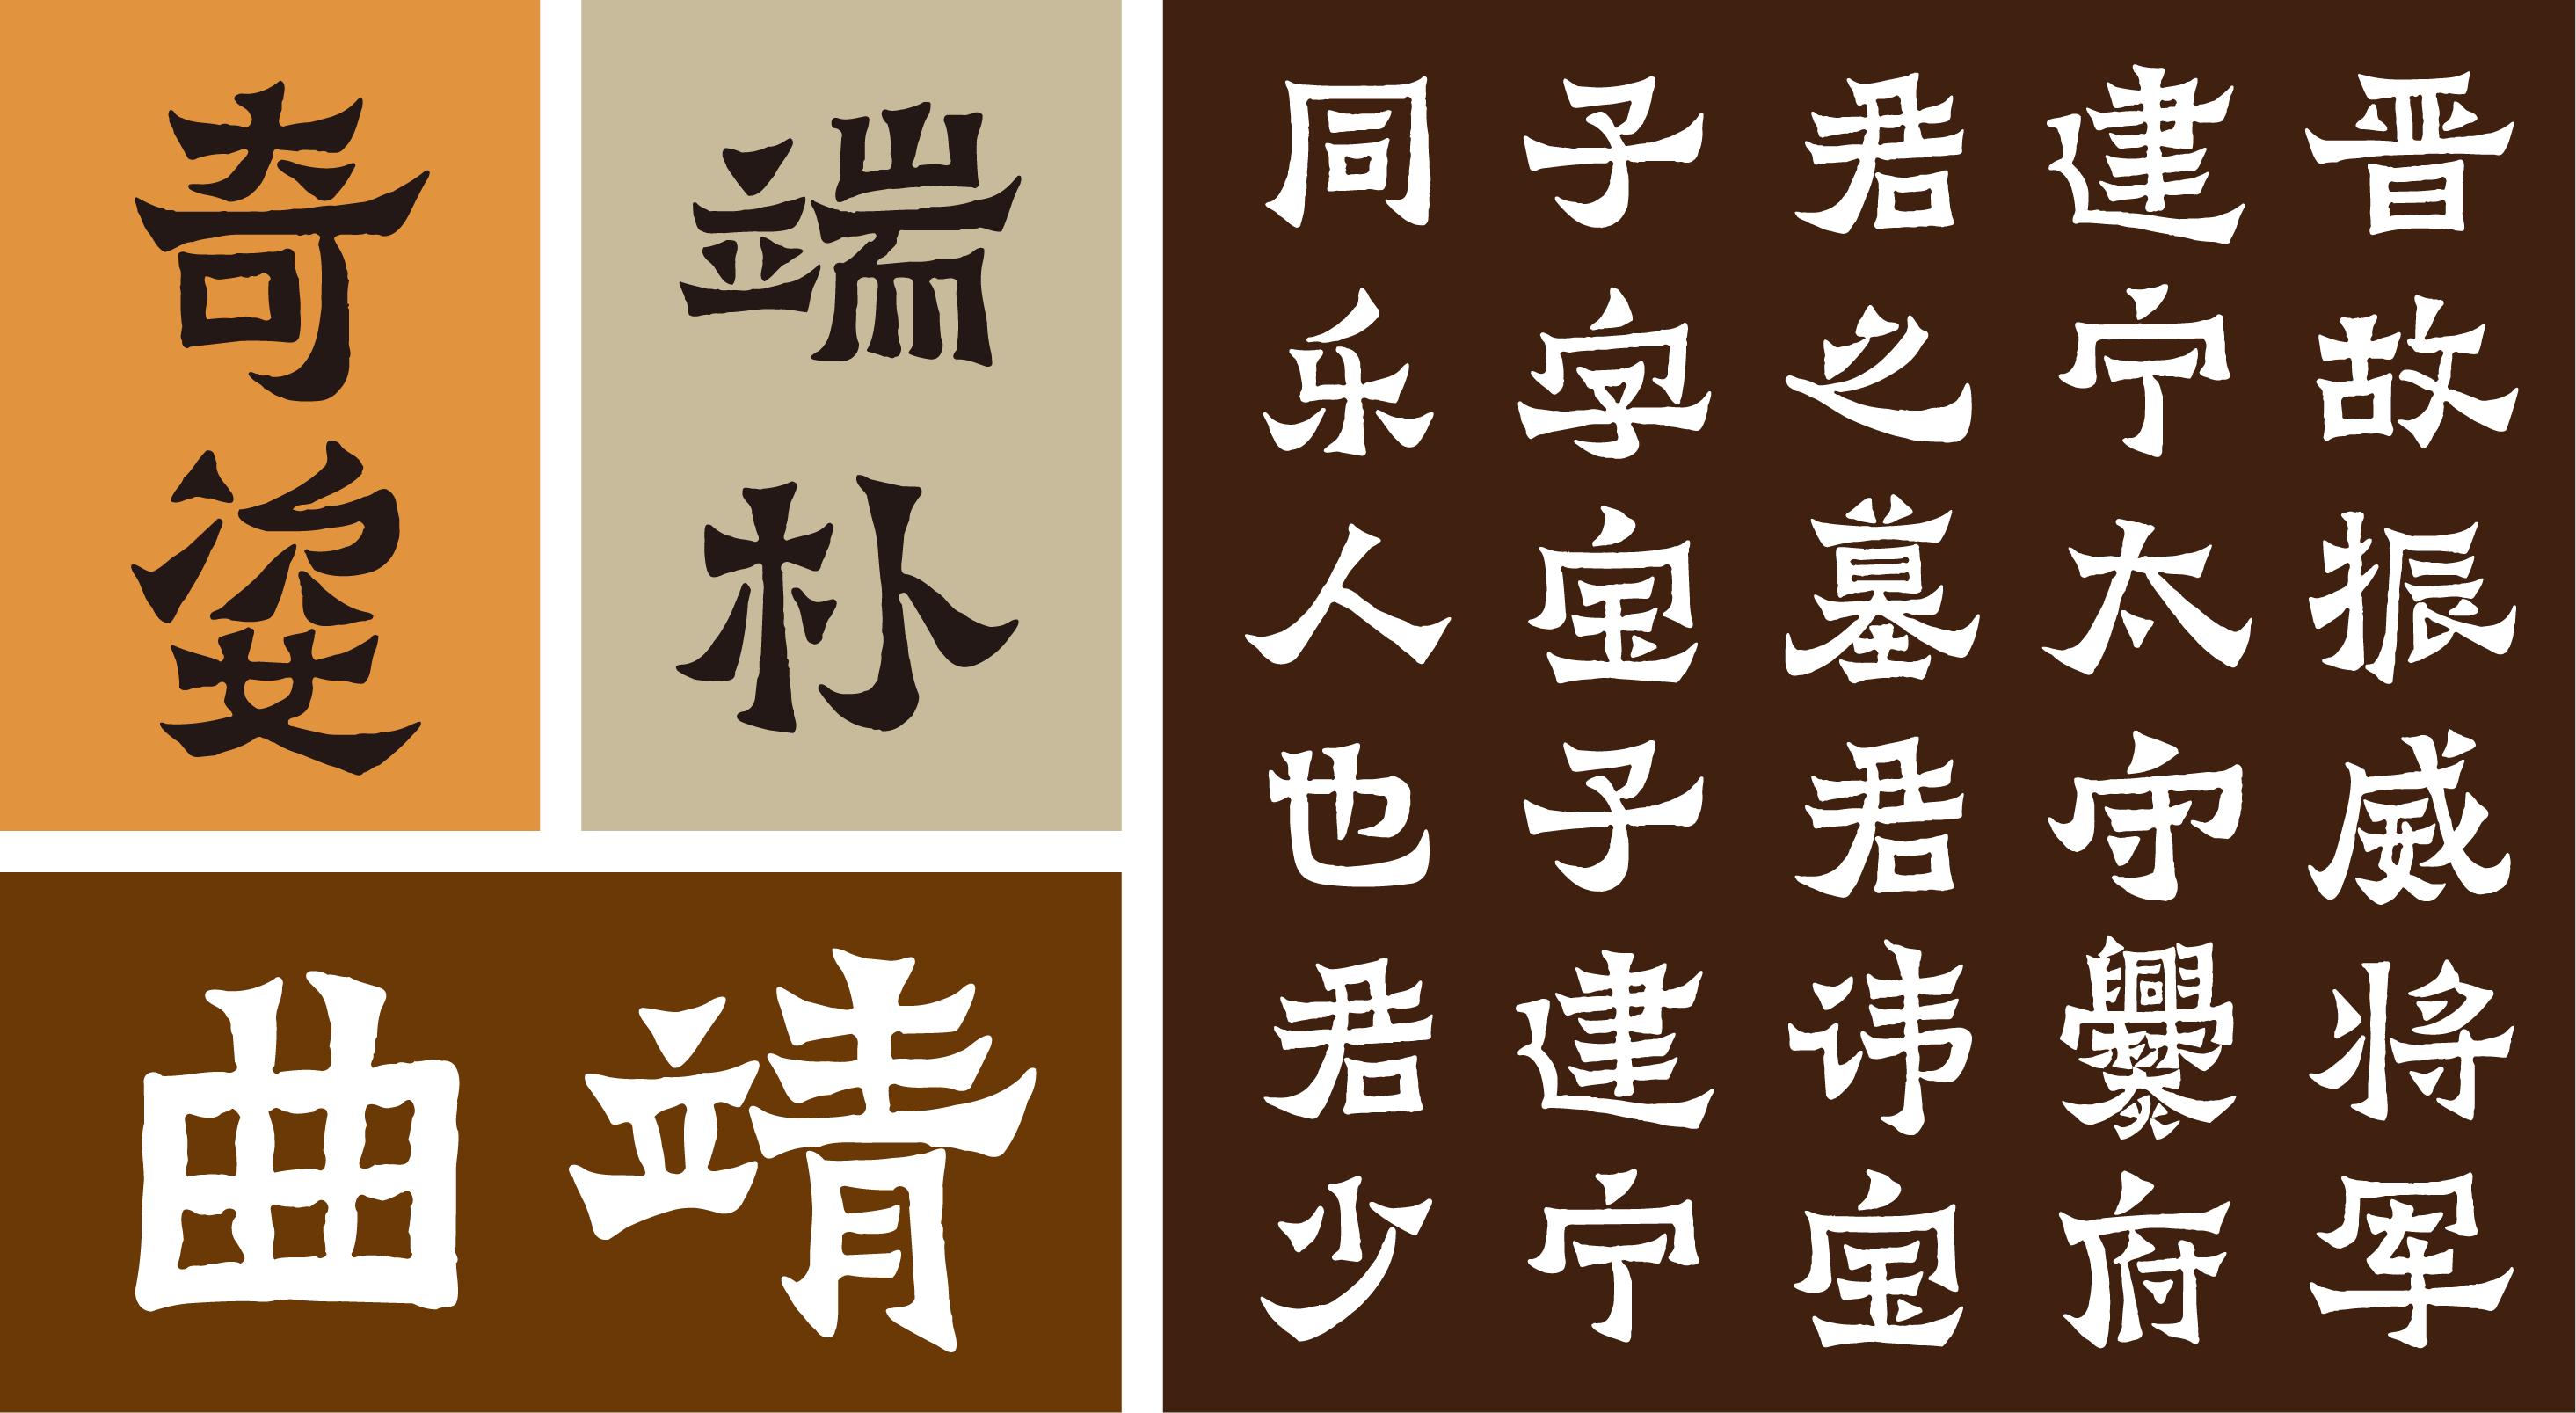 https://ft-bk1.oss-cn-zhangjiakou.aliyuncs.com/Public/Uploads/img/n_content_20201210174809_4910.png